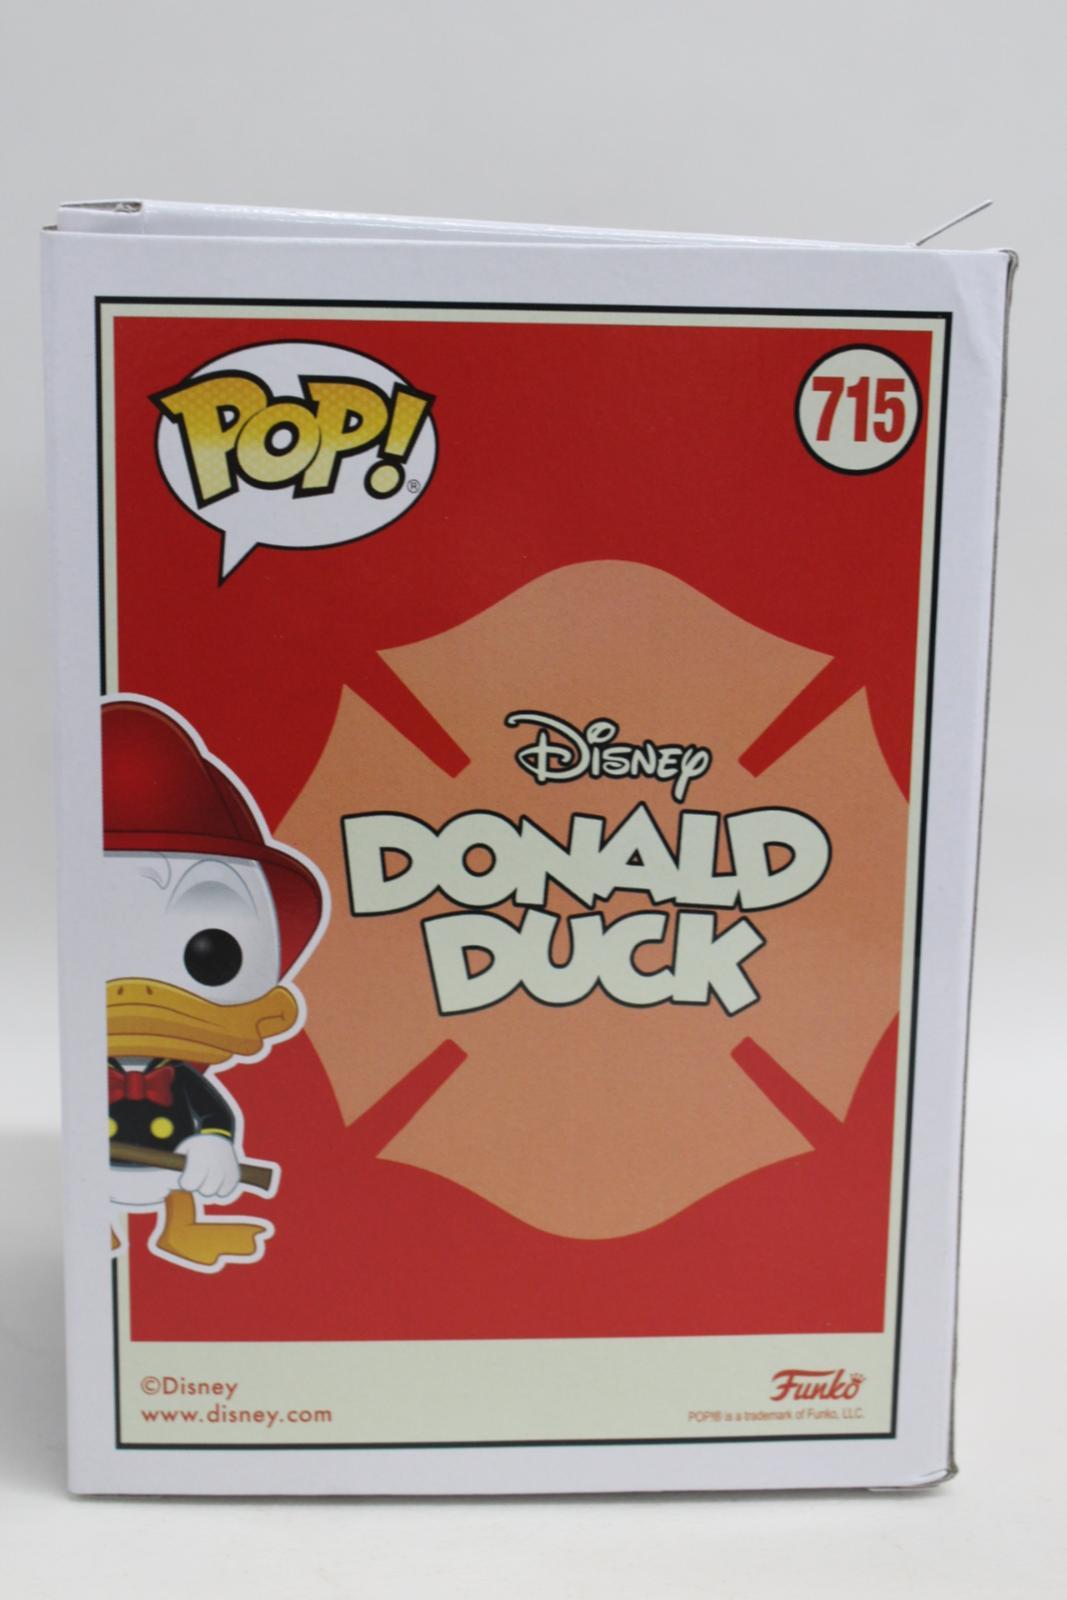 FUNKO-Pop-Disney-bomberos-Donald-Duck-NYCC-Exclusivo-Preventa-Nuevo-compartida miniatura 7